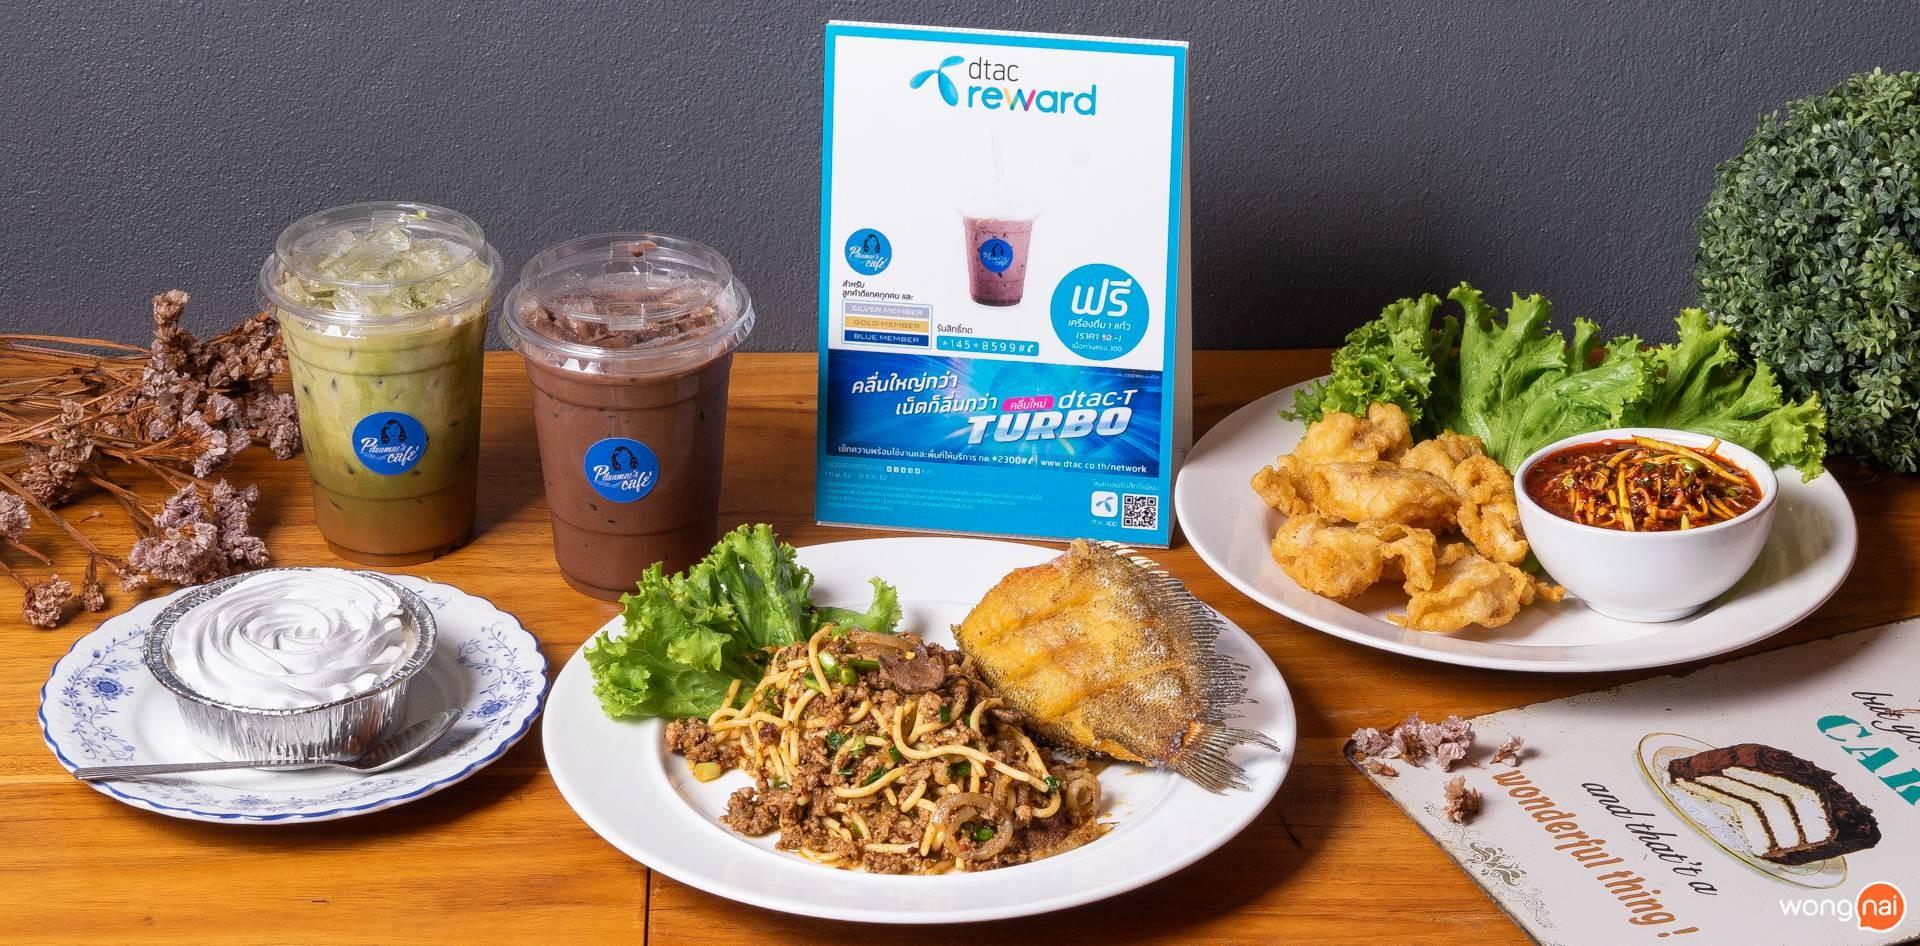 Pitsamai's Cafe'